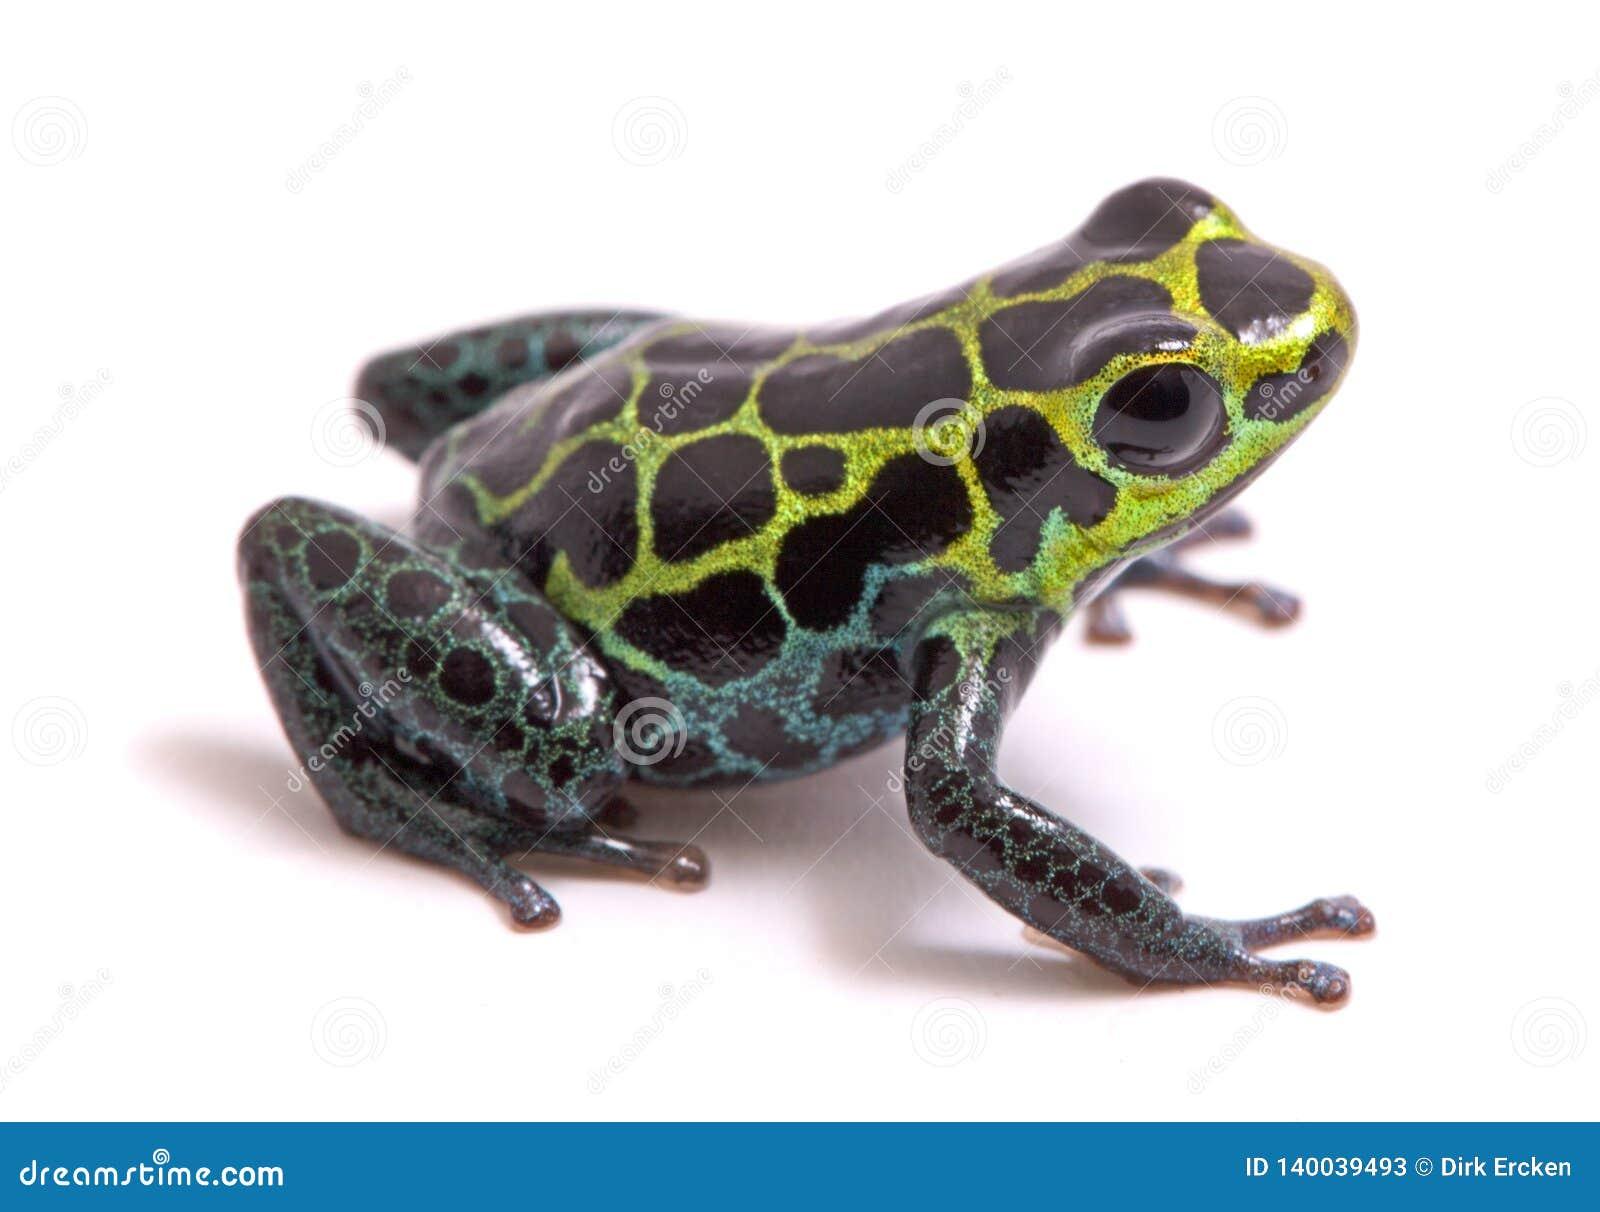 Small poison dart or arrow frog, Ranitomeya variabilis